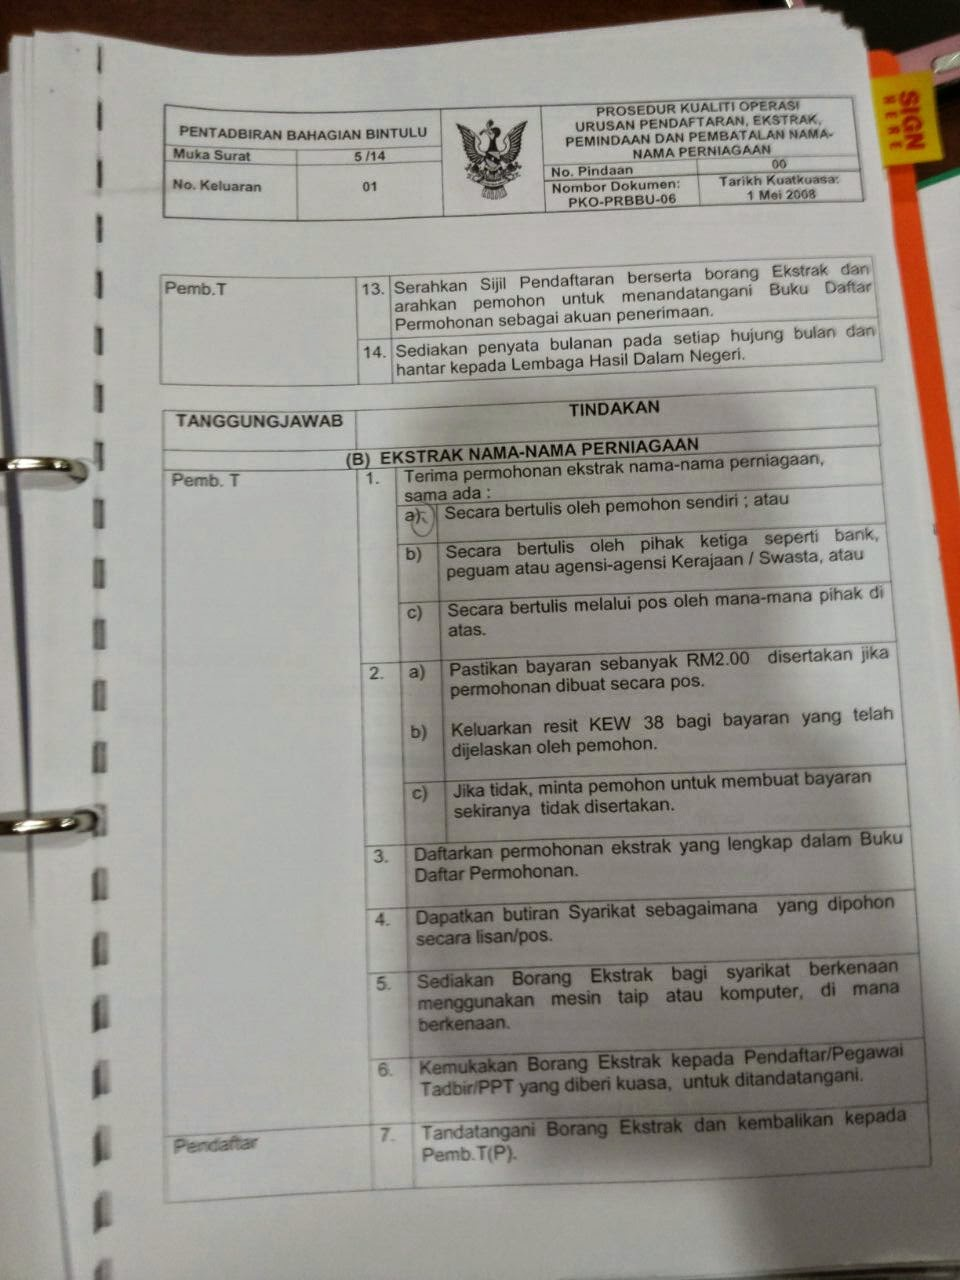 vege krunch: Interview Pejabat Residen Bintulu ( Penubuhan ...